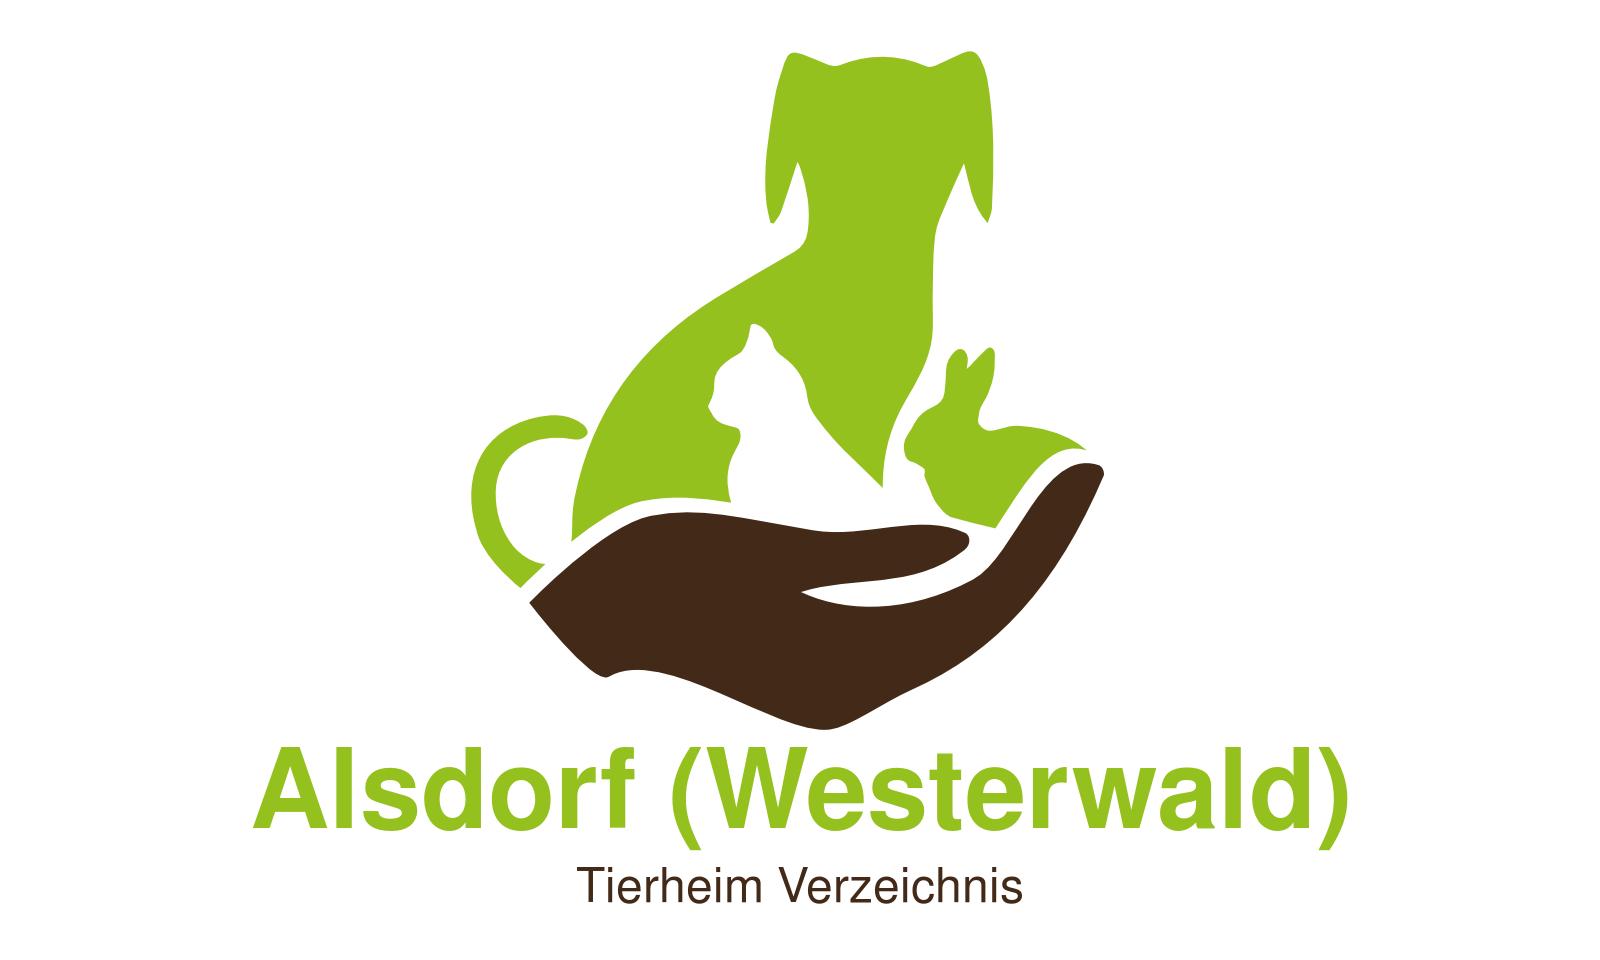 Tierheim Alsdorf (Westerwald)